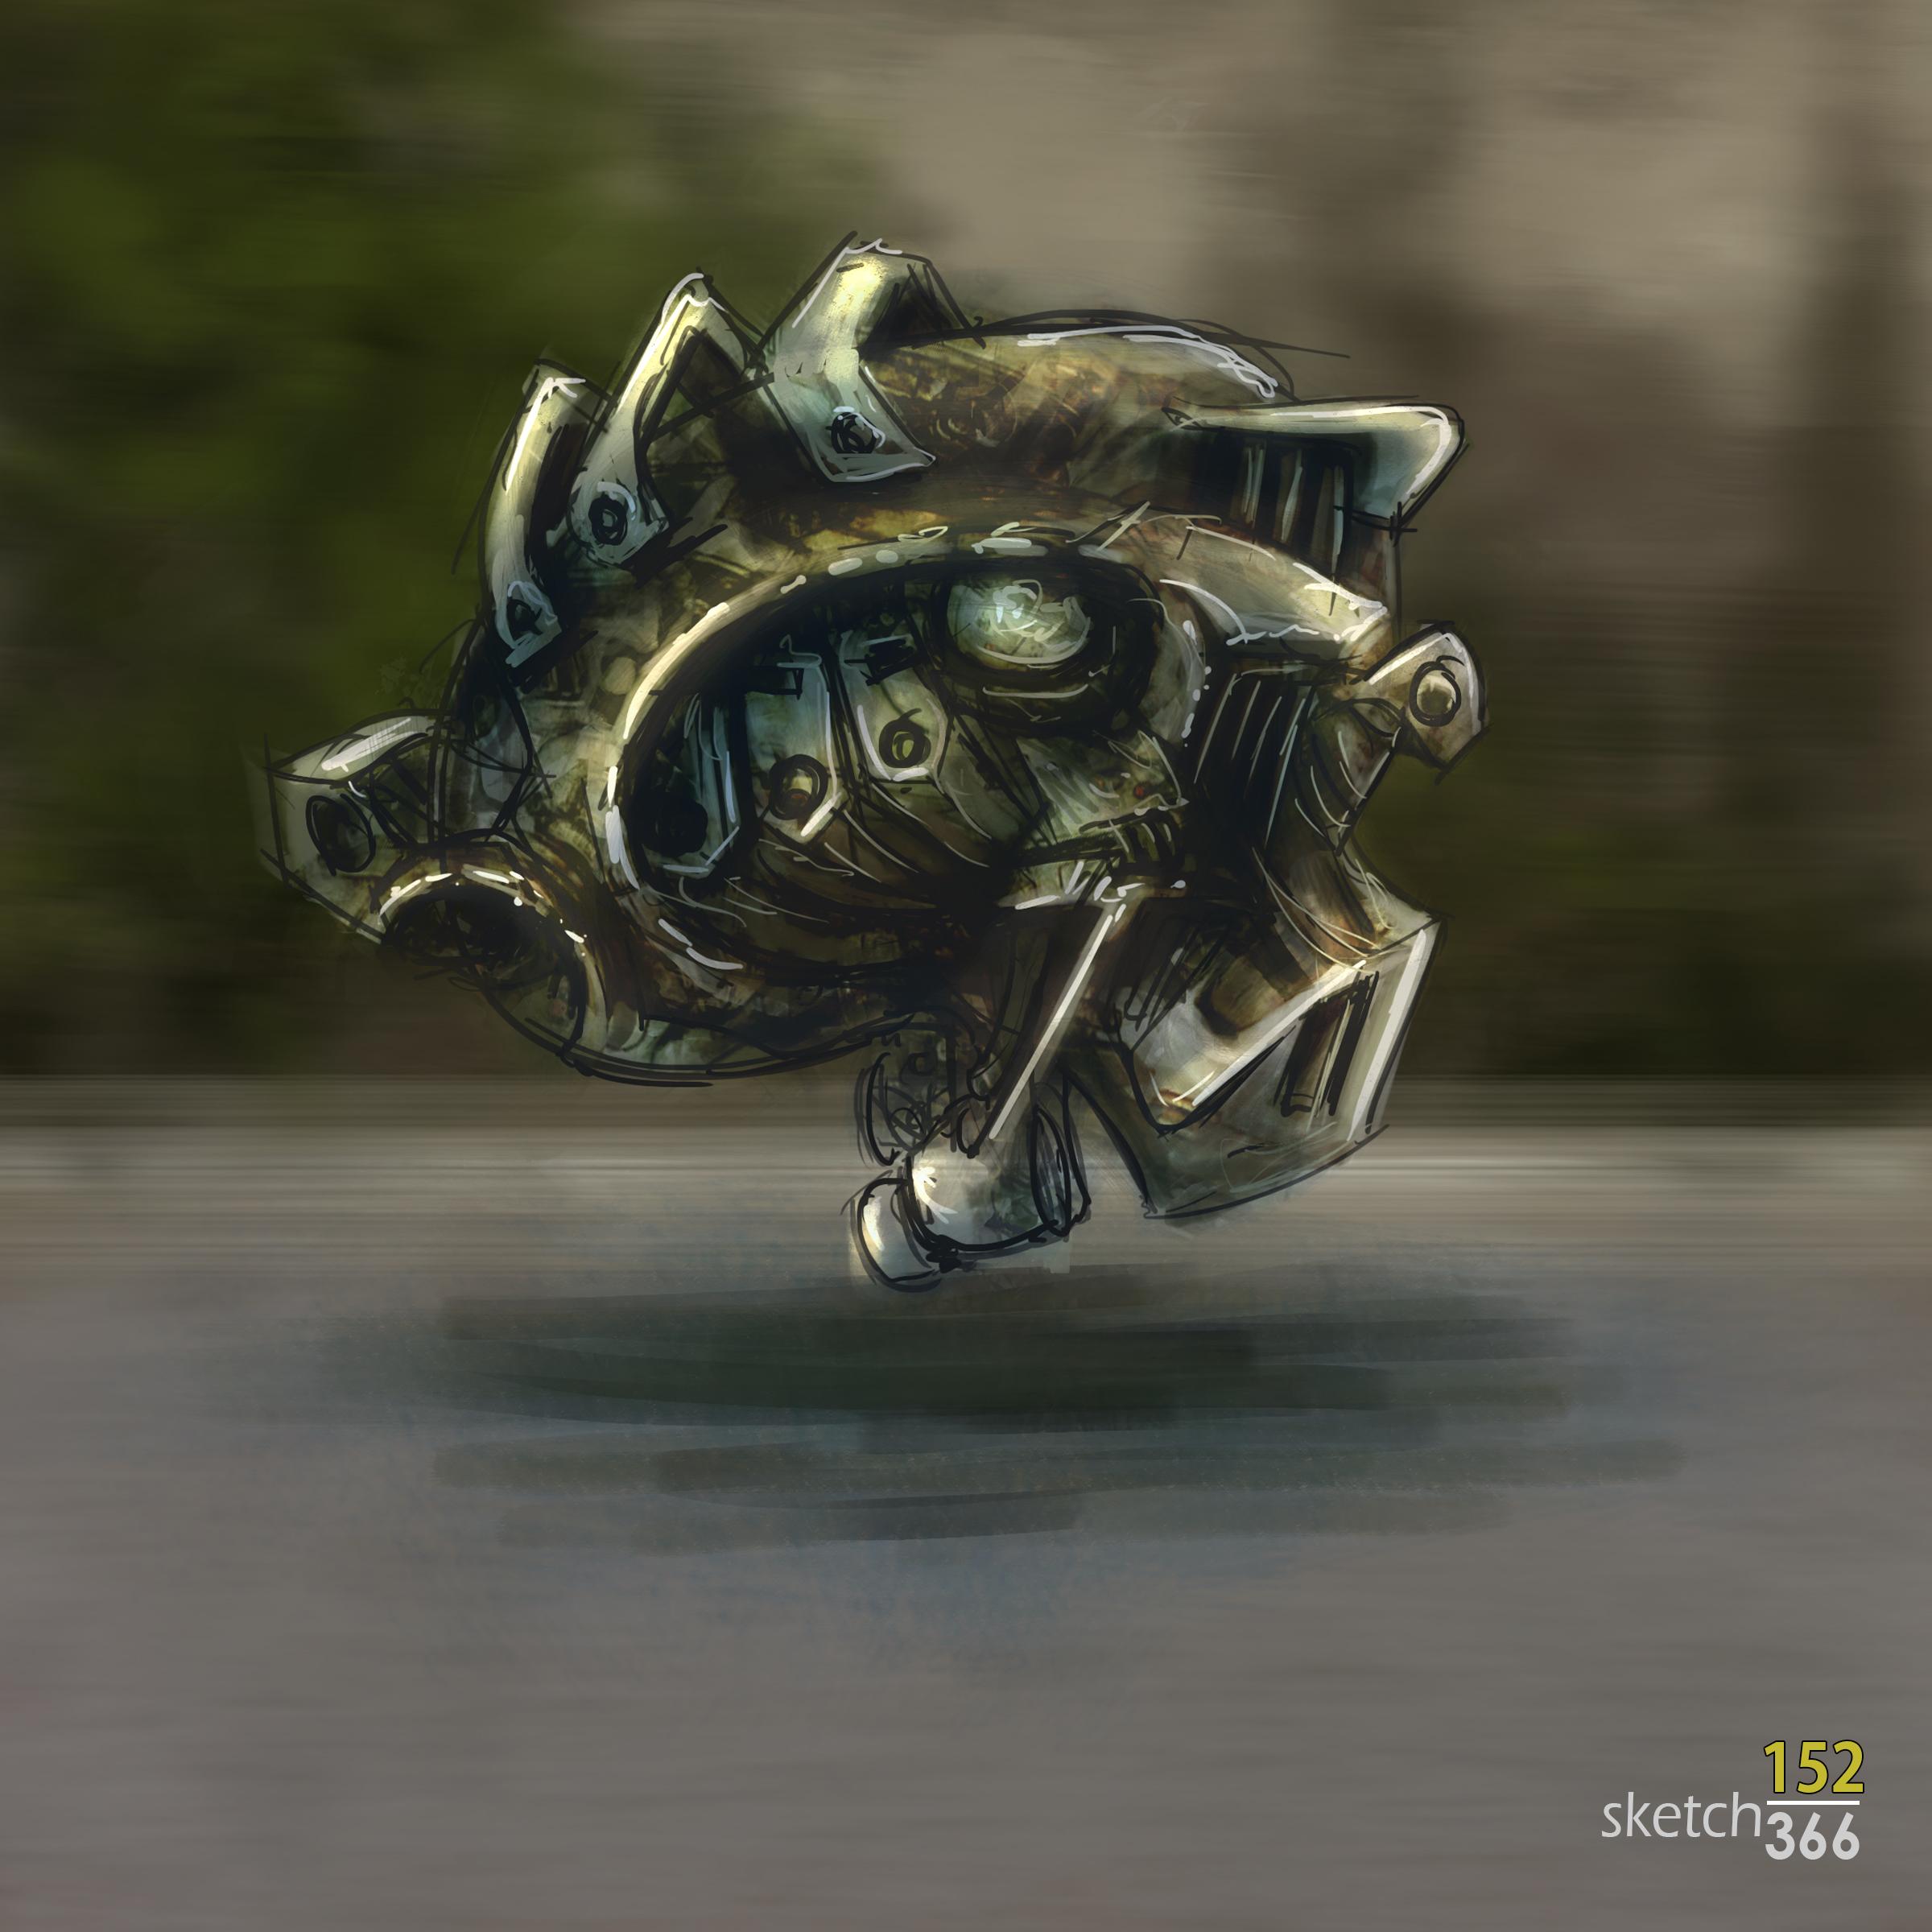 Random alien vehicle